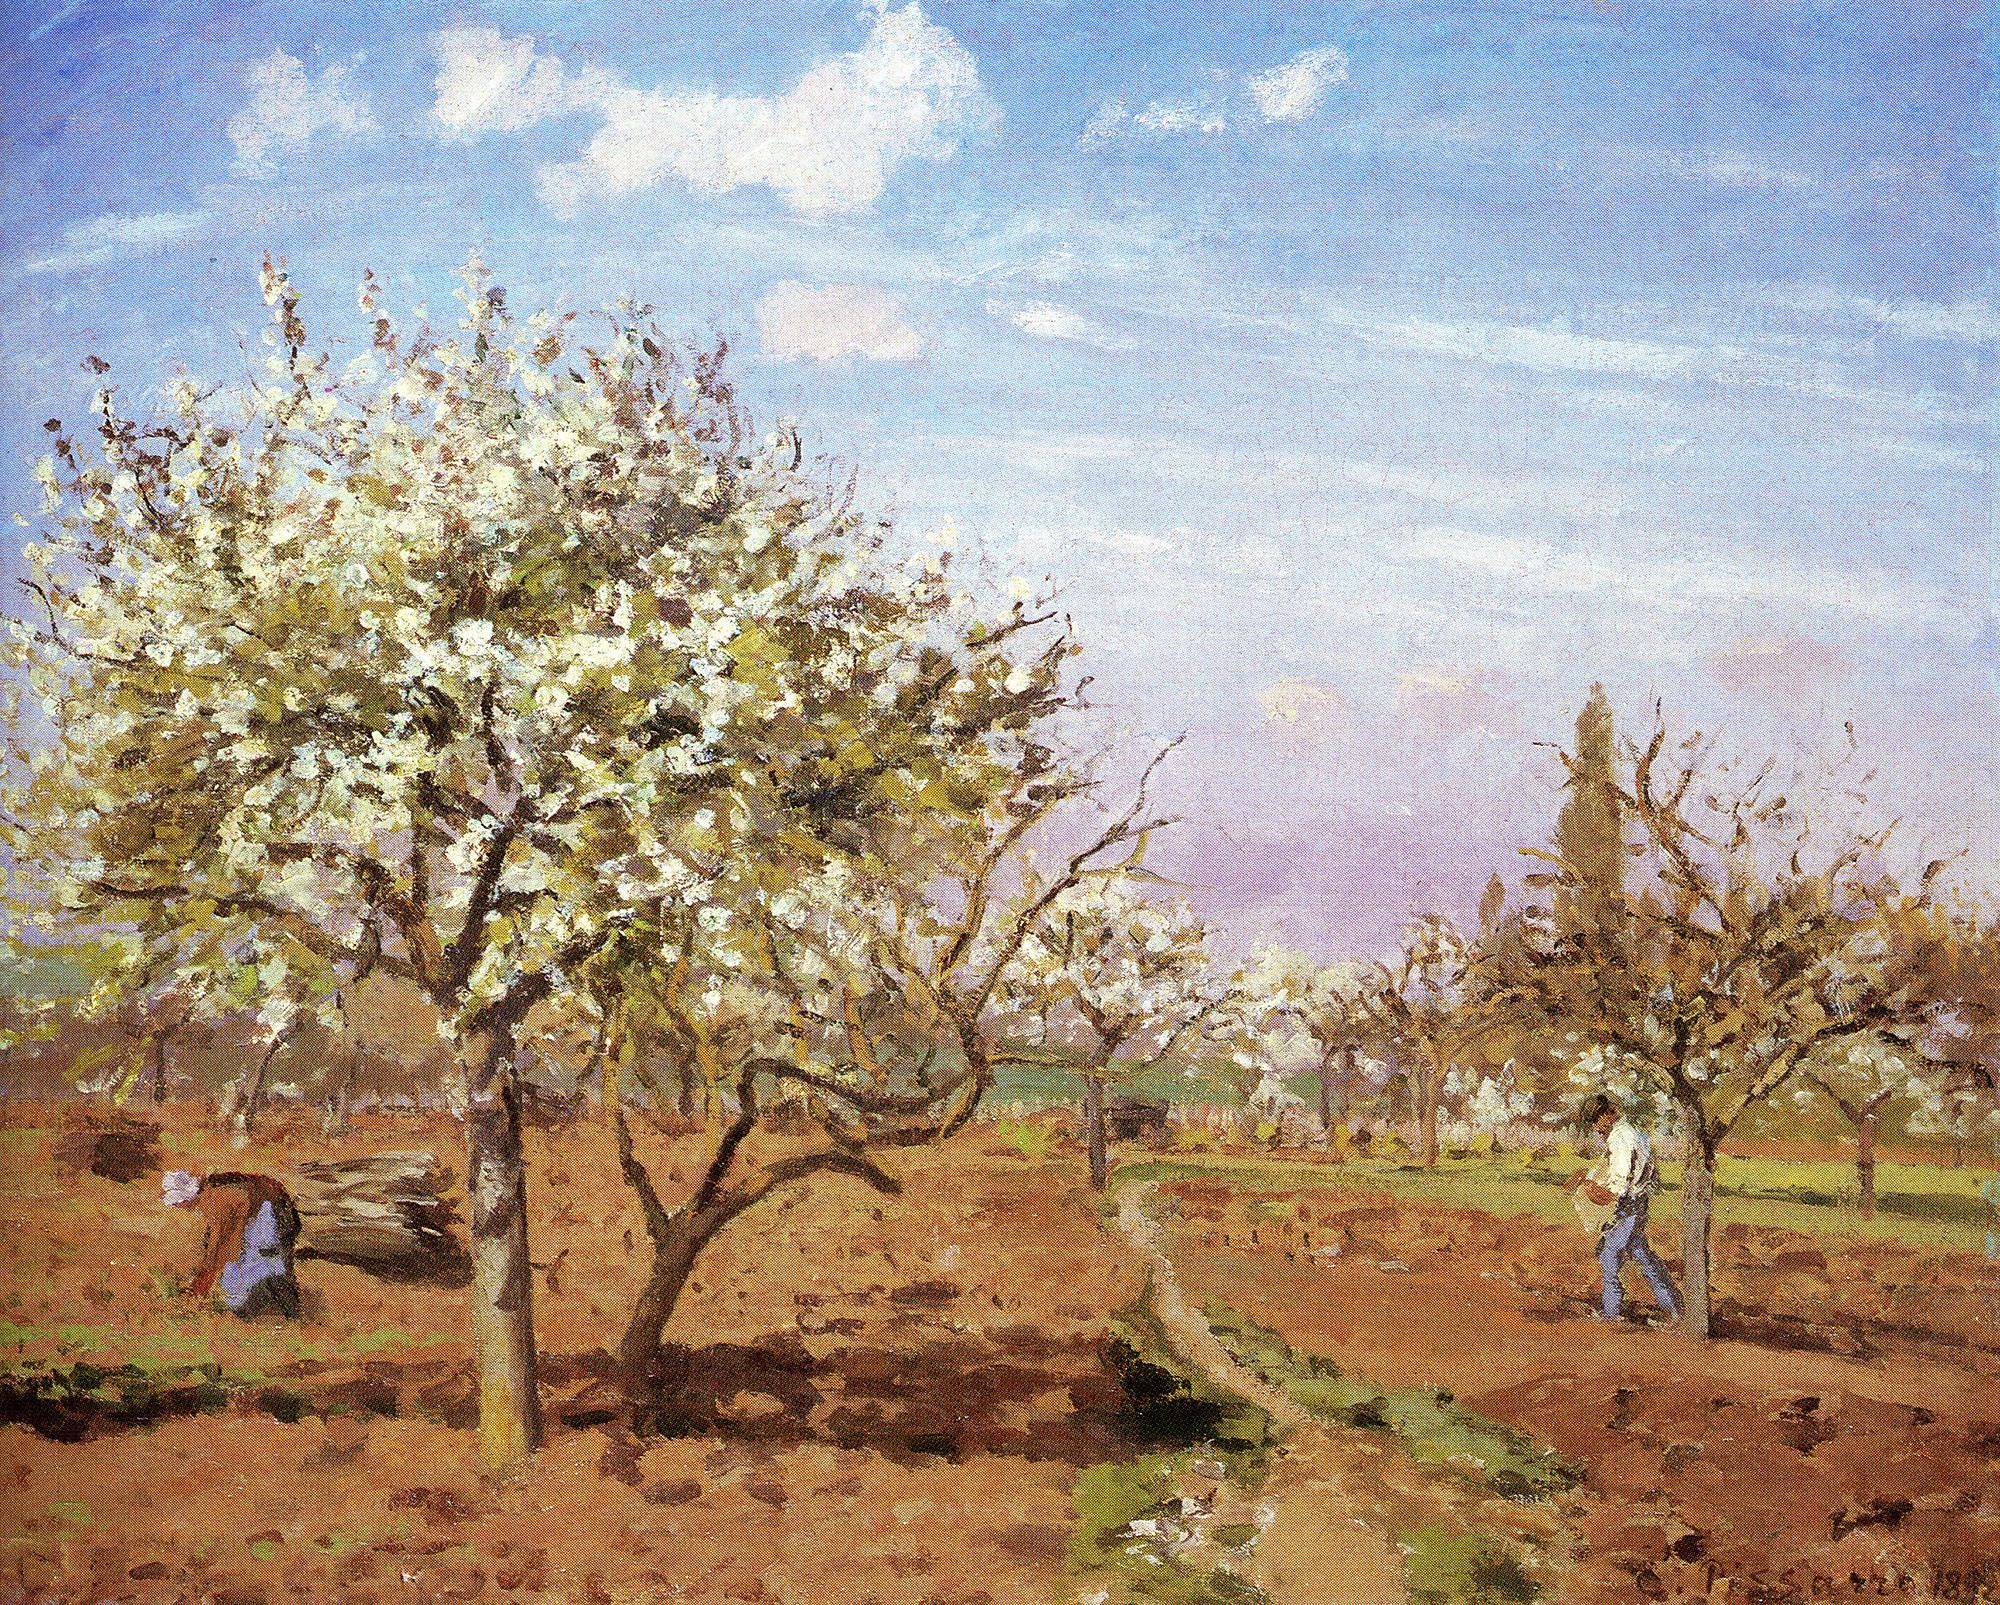 Camille Pissarro, Orchard in Bloom, Louveciennes, 1872